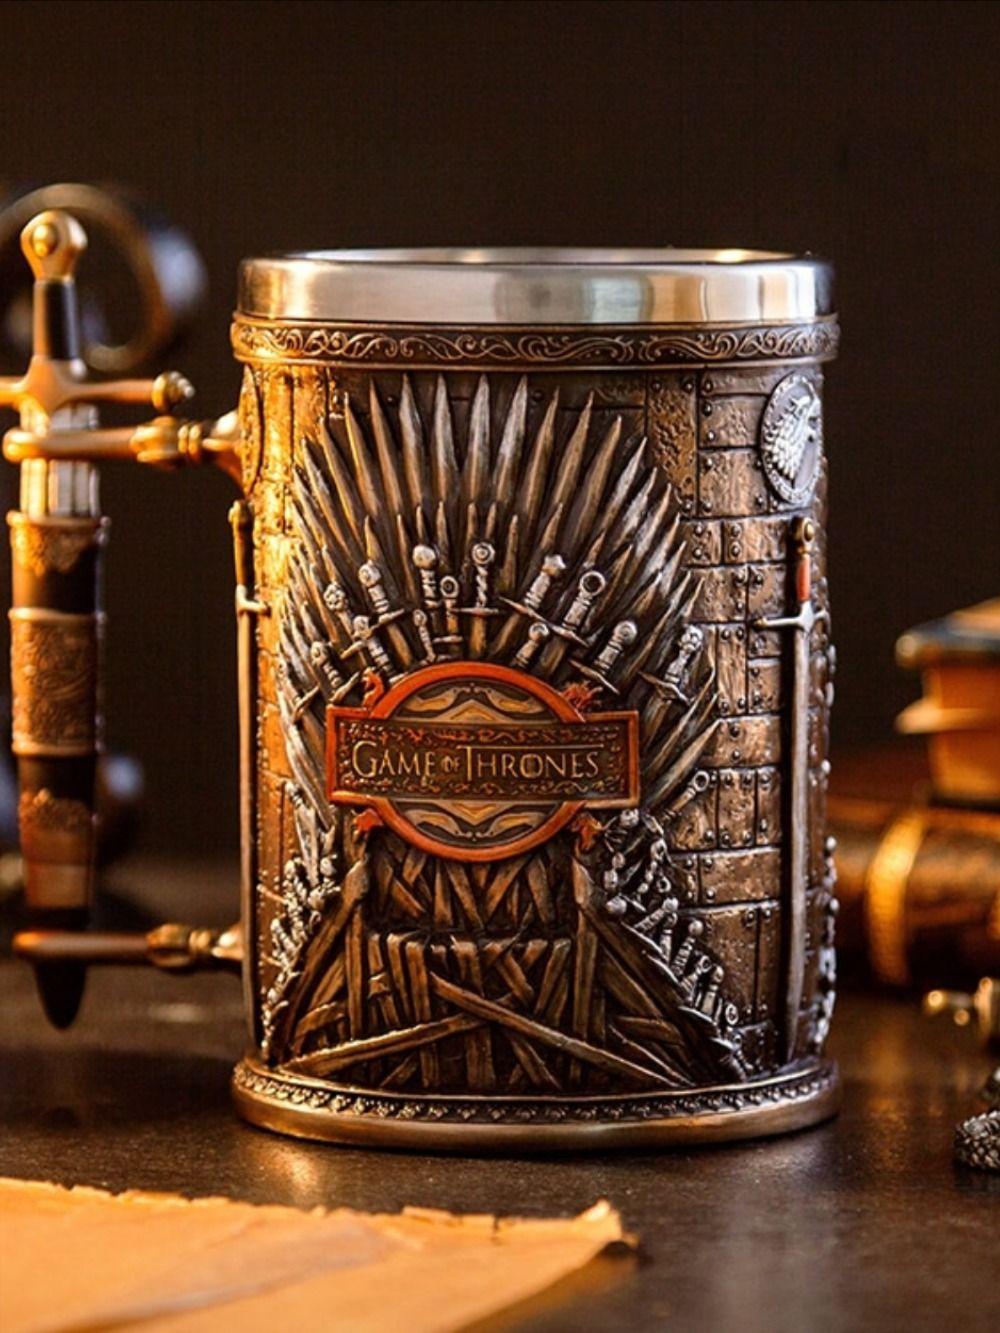 Game of Thrones accessories figures